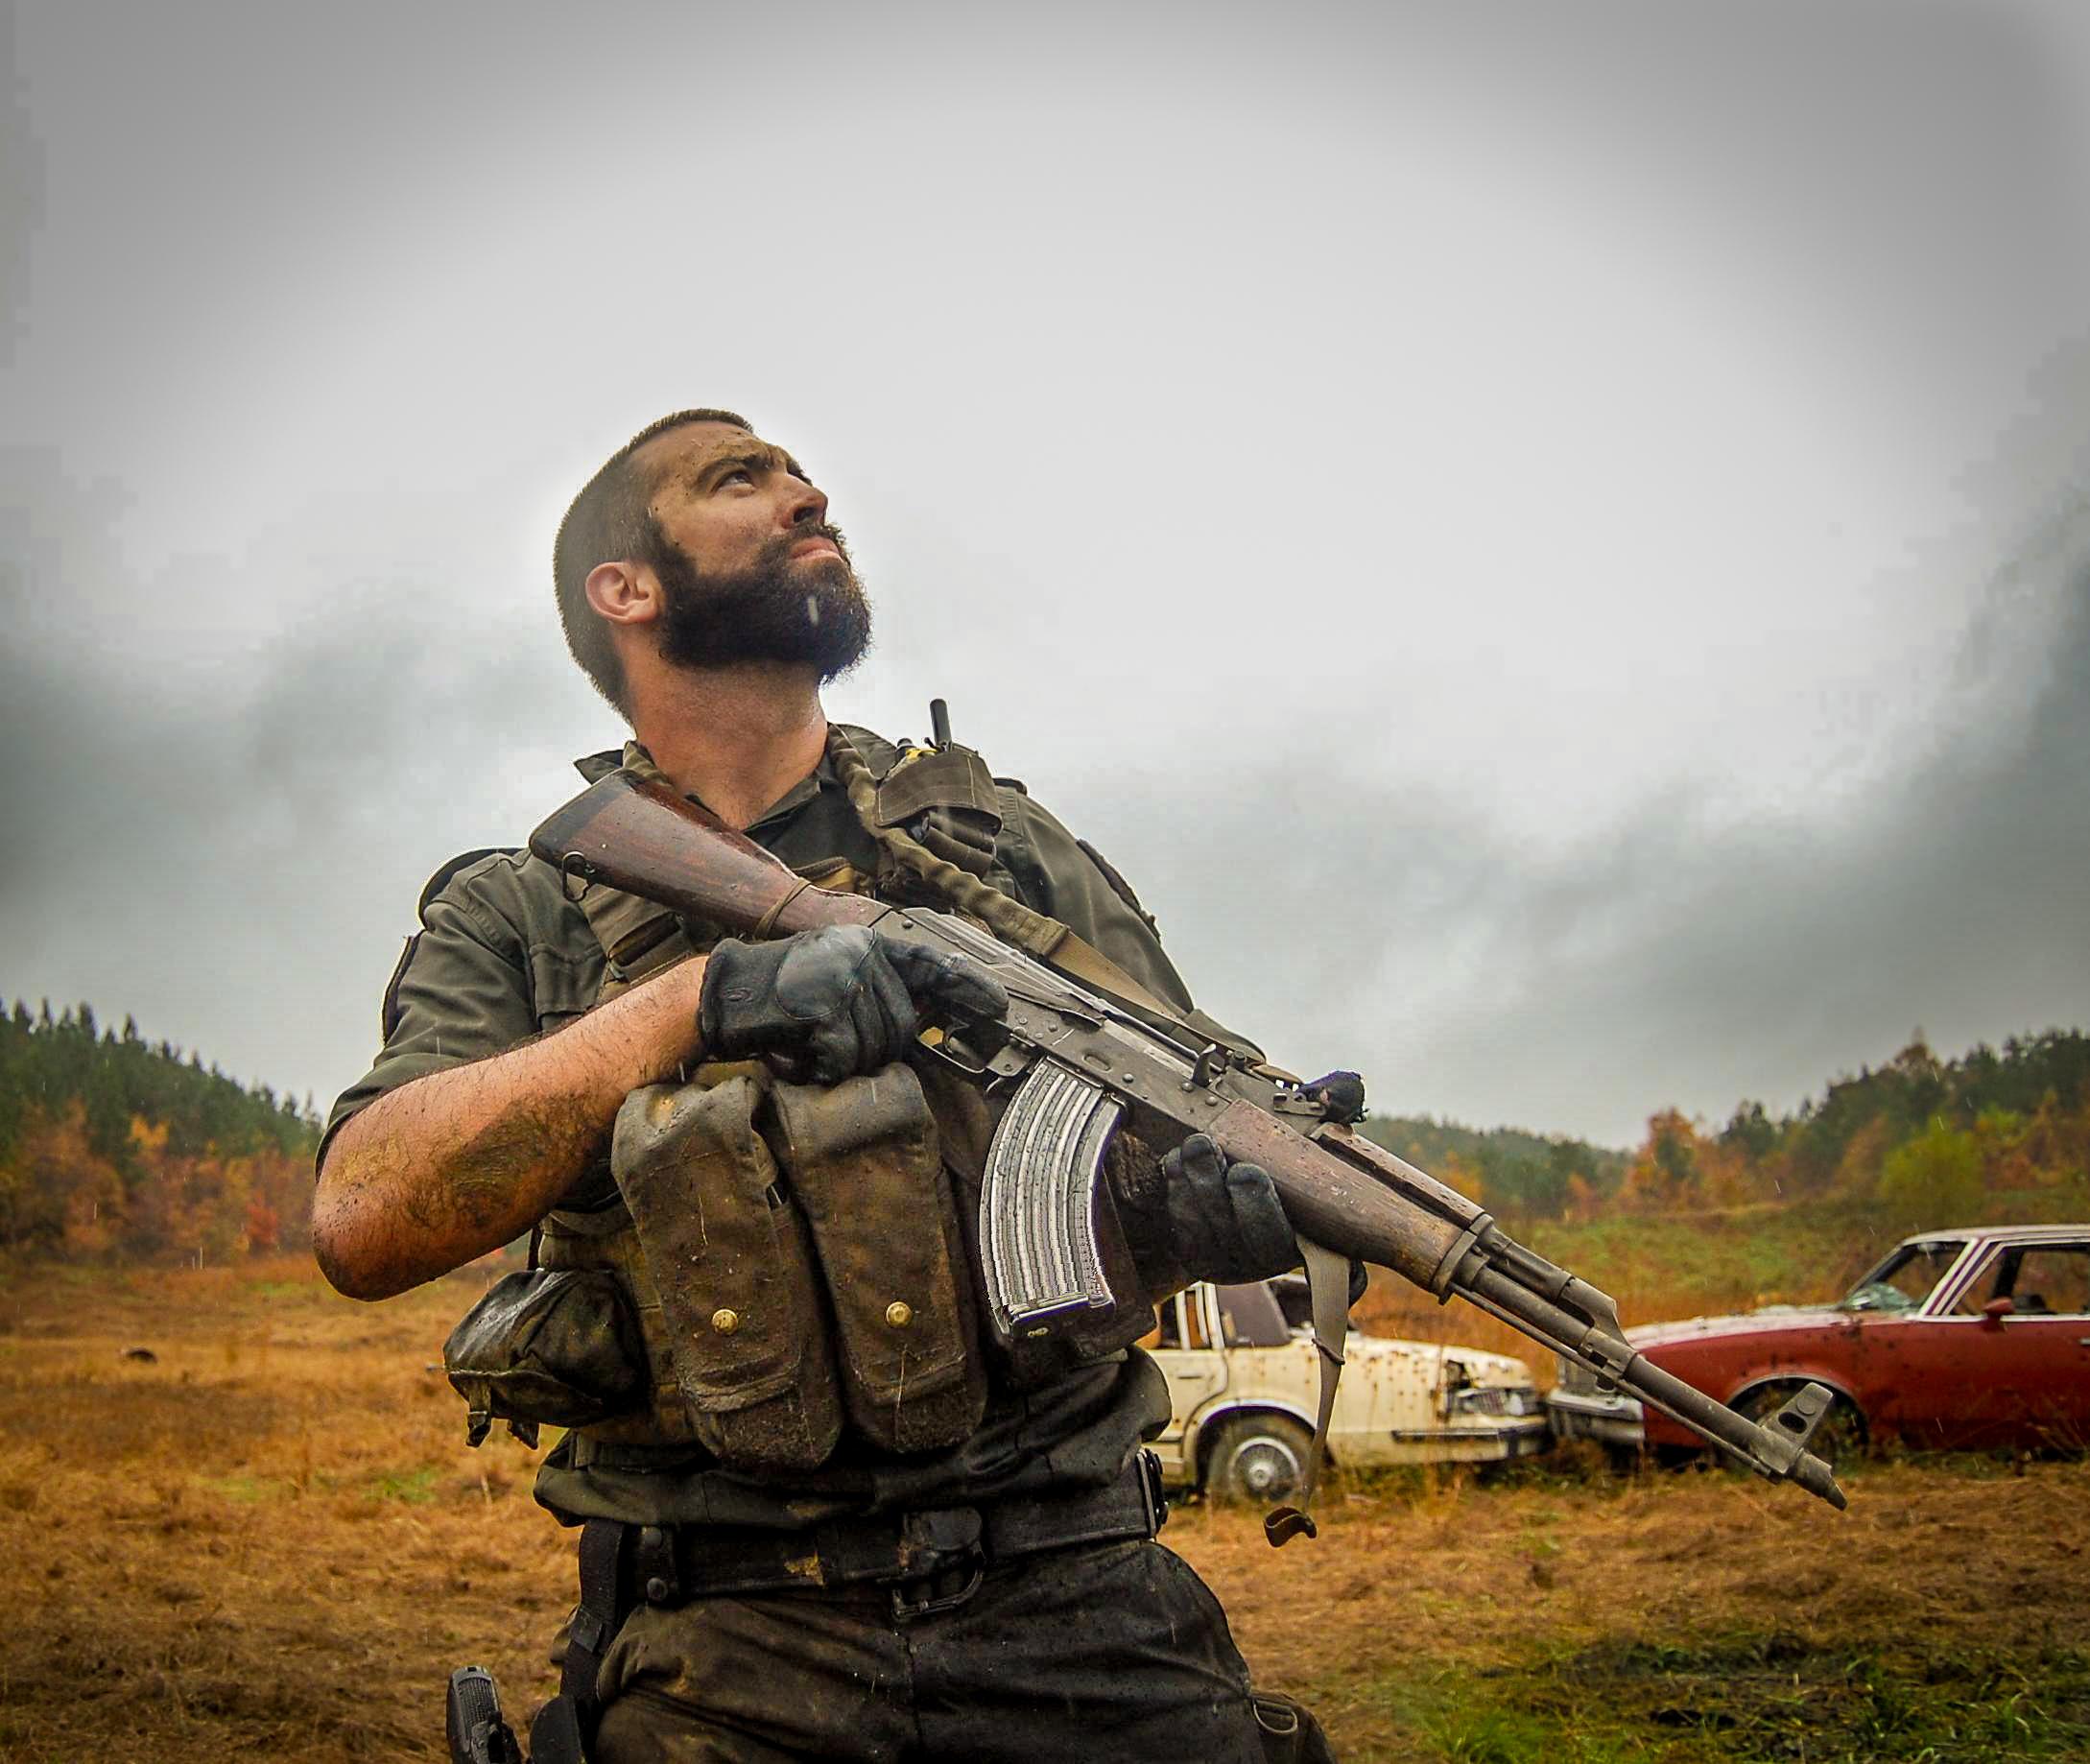 AKM 47